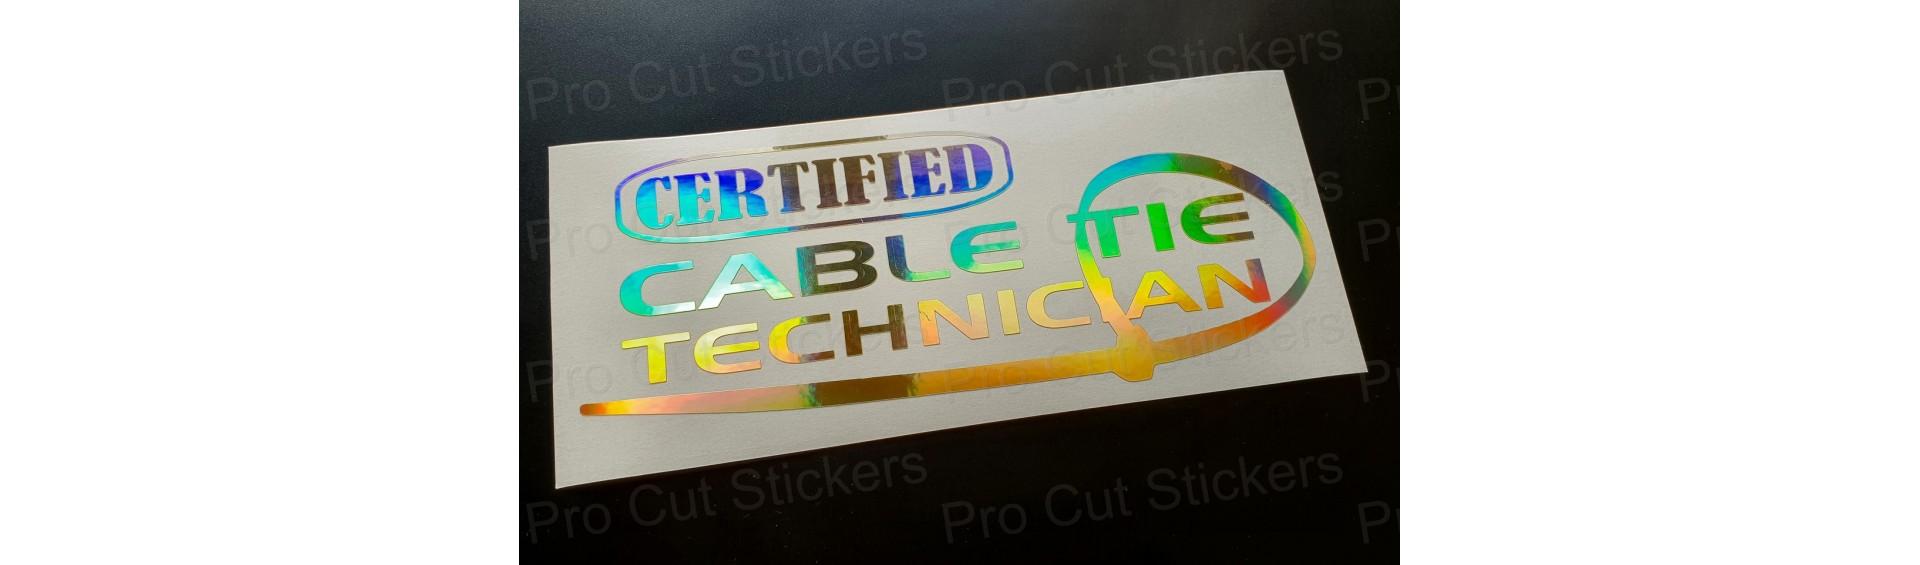 Custom Design Stickers